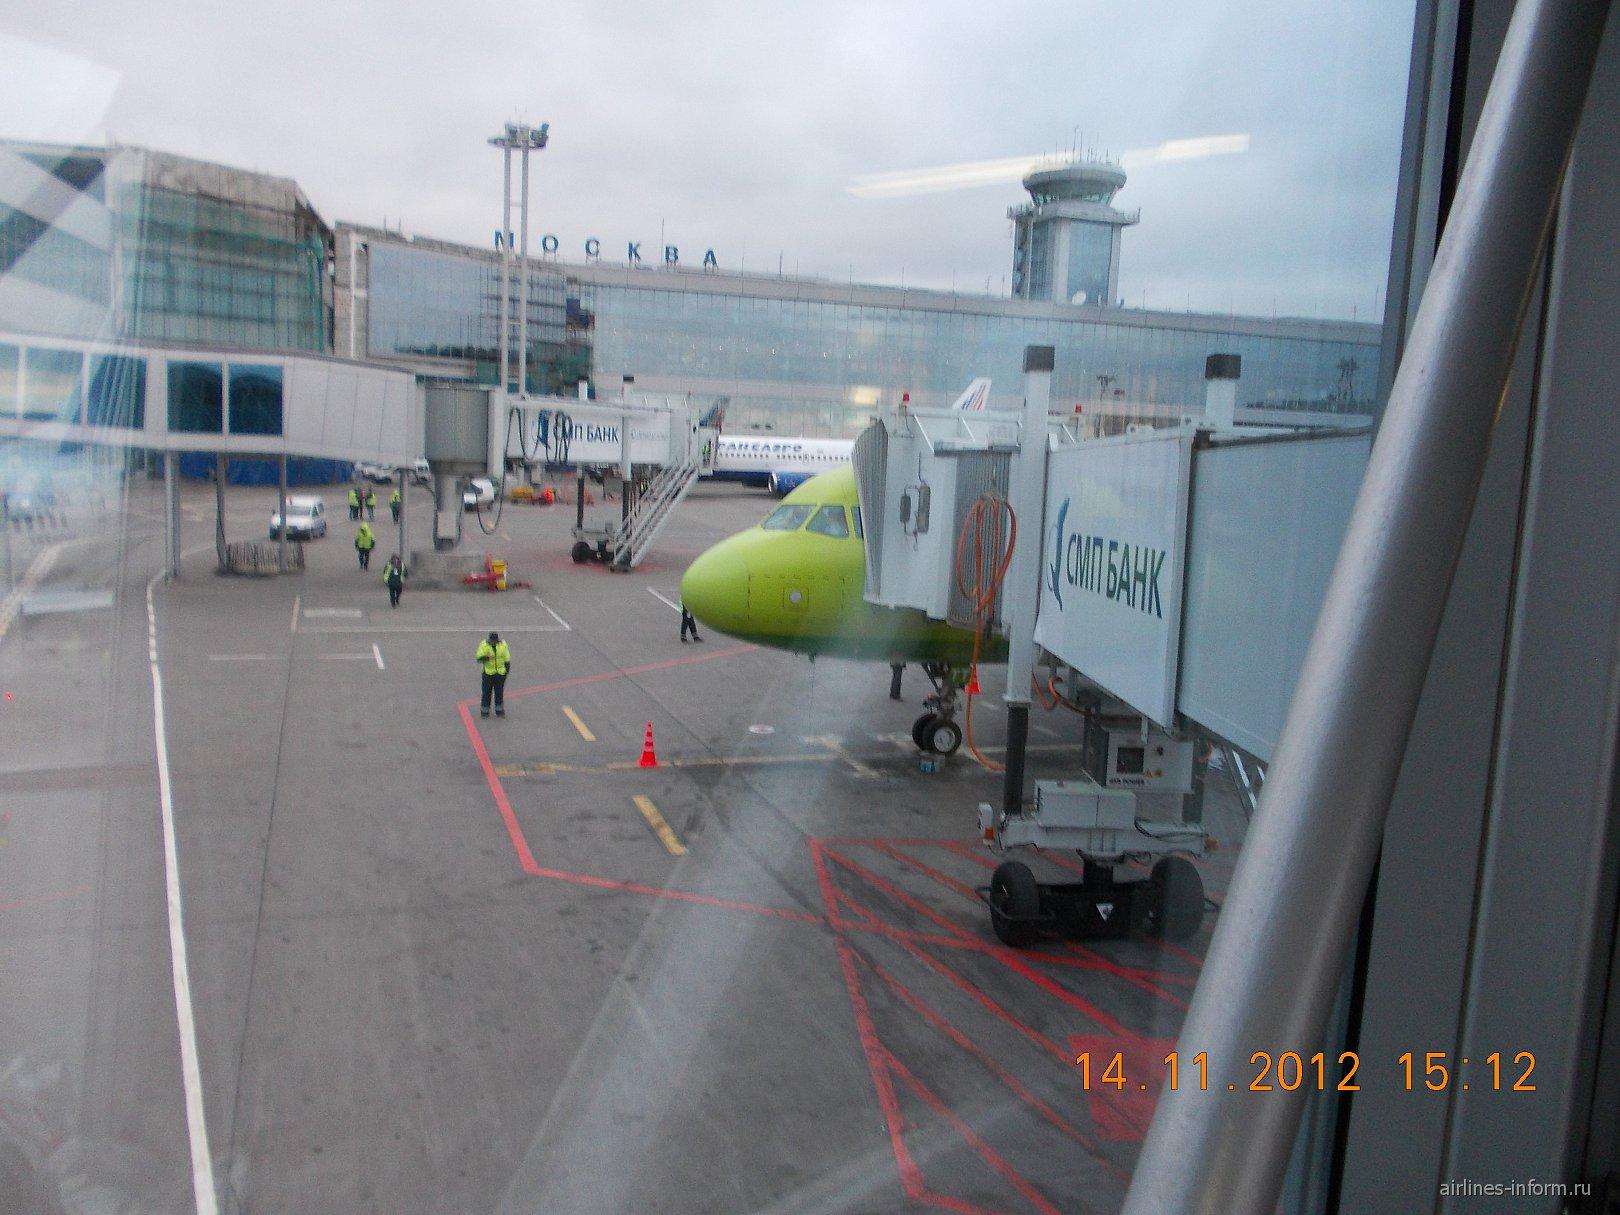 Посадка на рейс Москва-Астрахань авиакомпании S7 Airlines